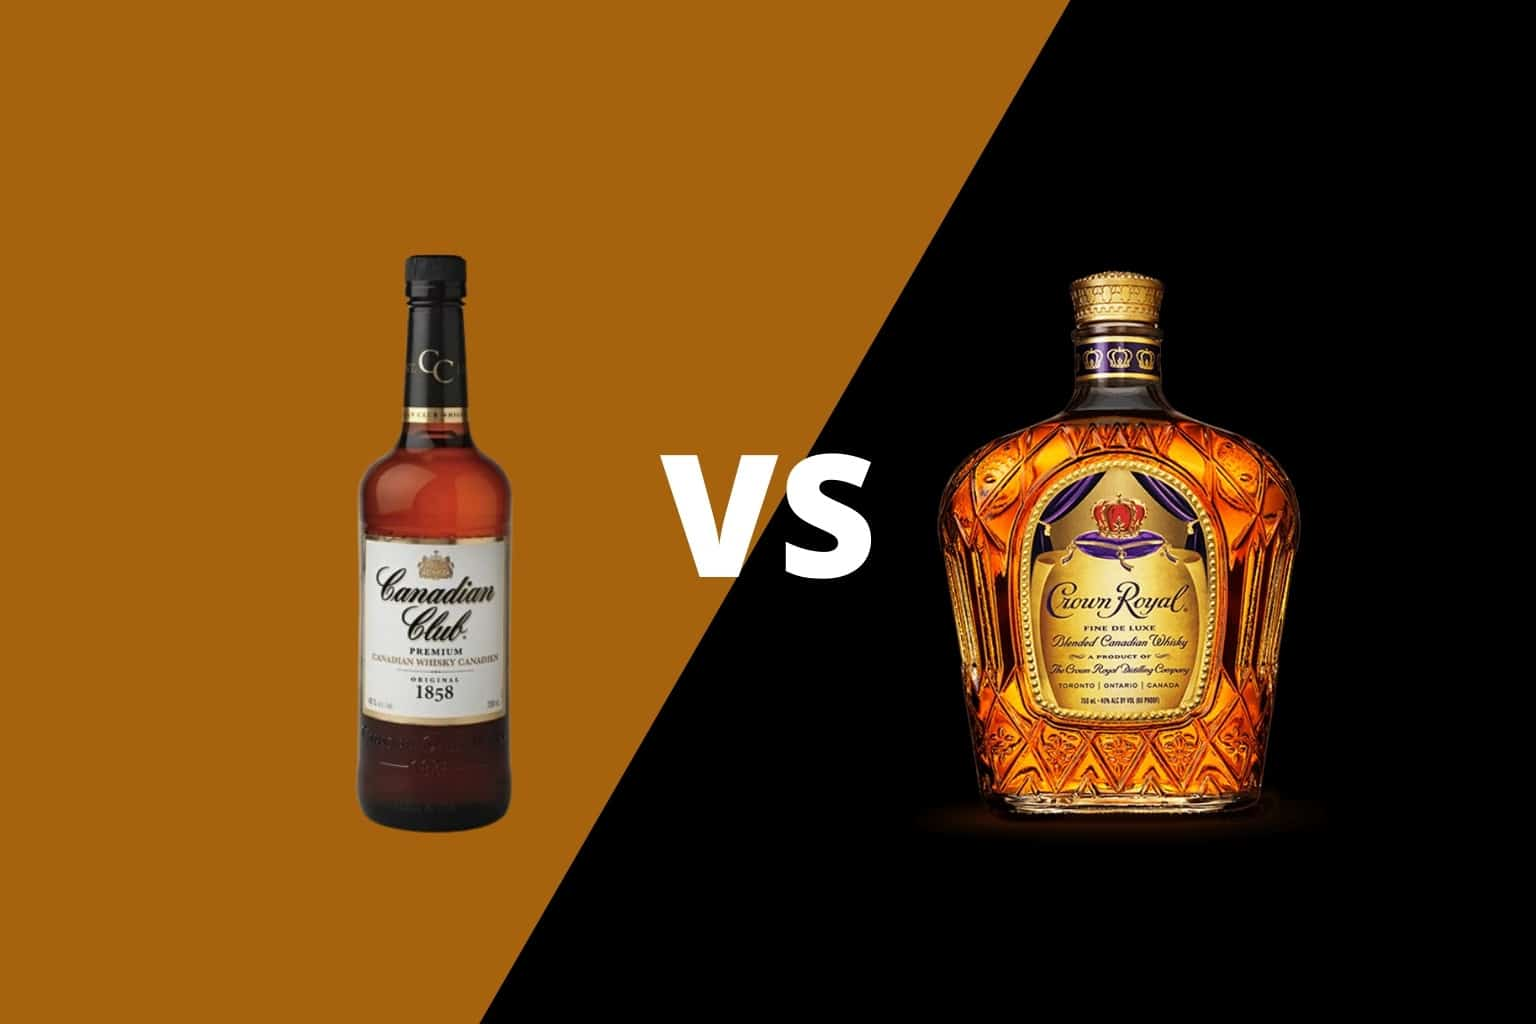 Canadian Club vs Crown Royal